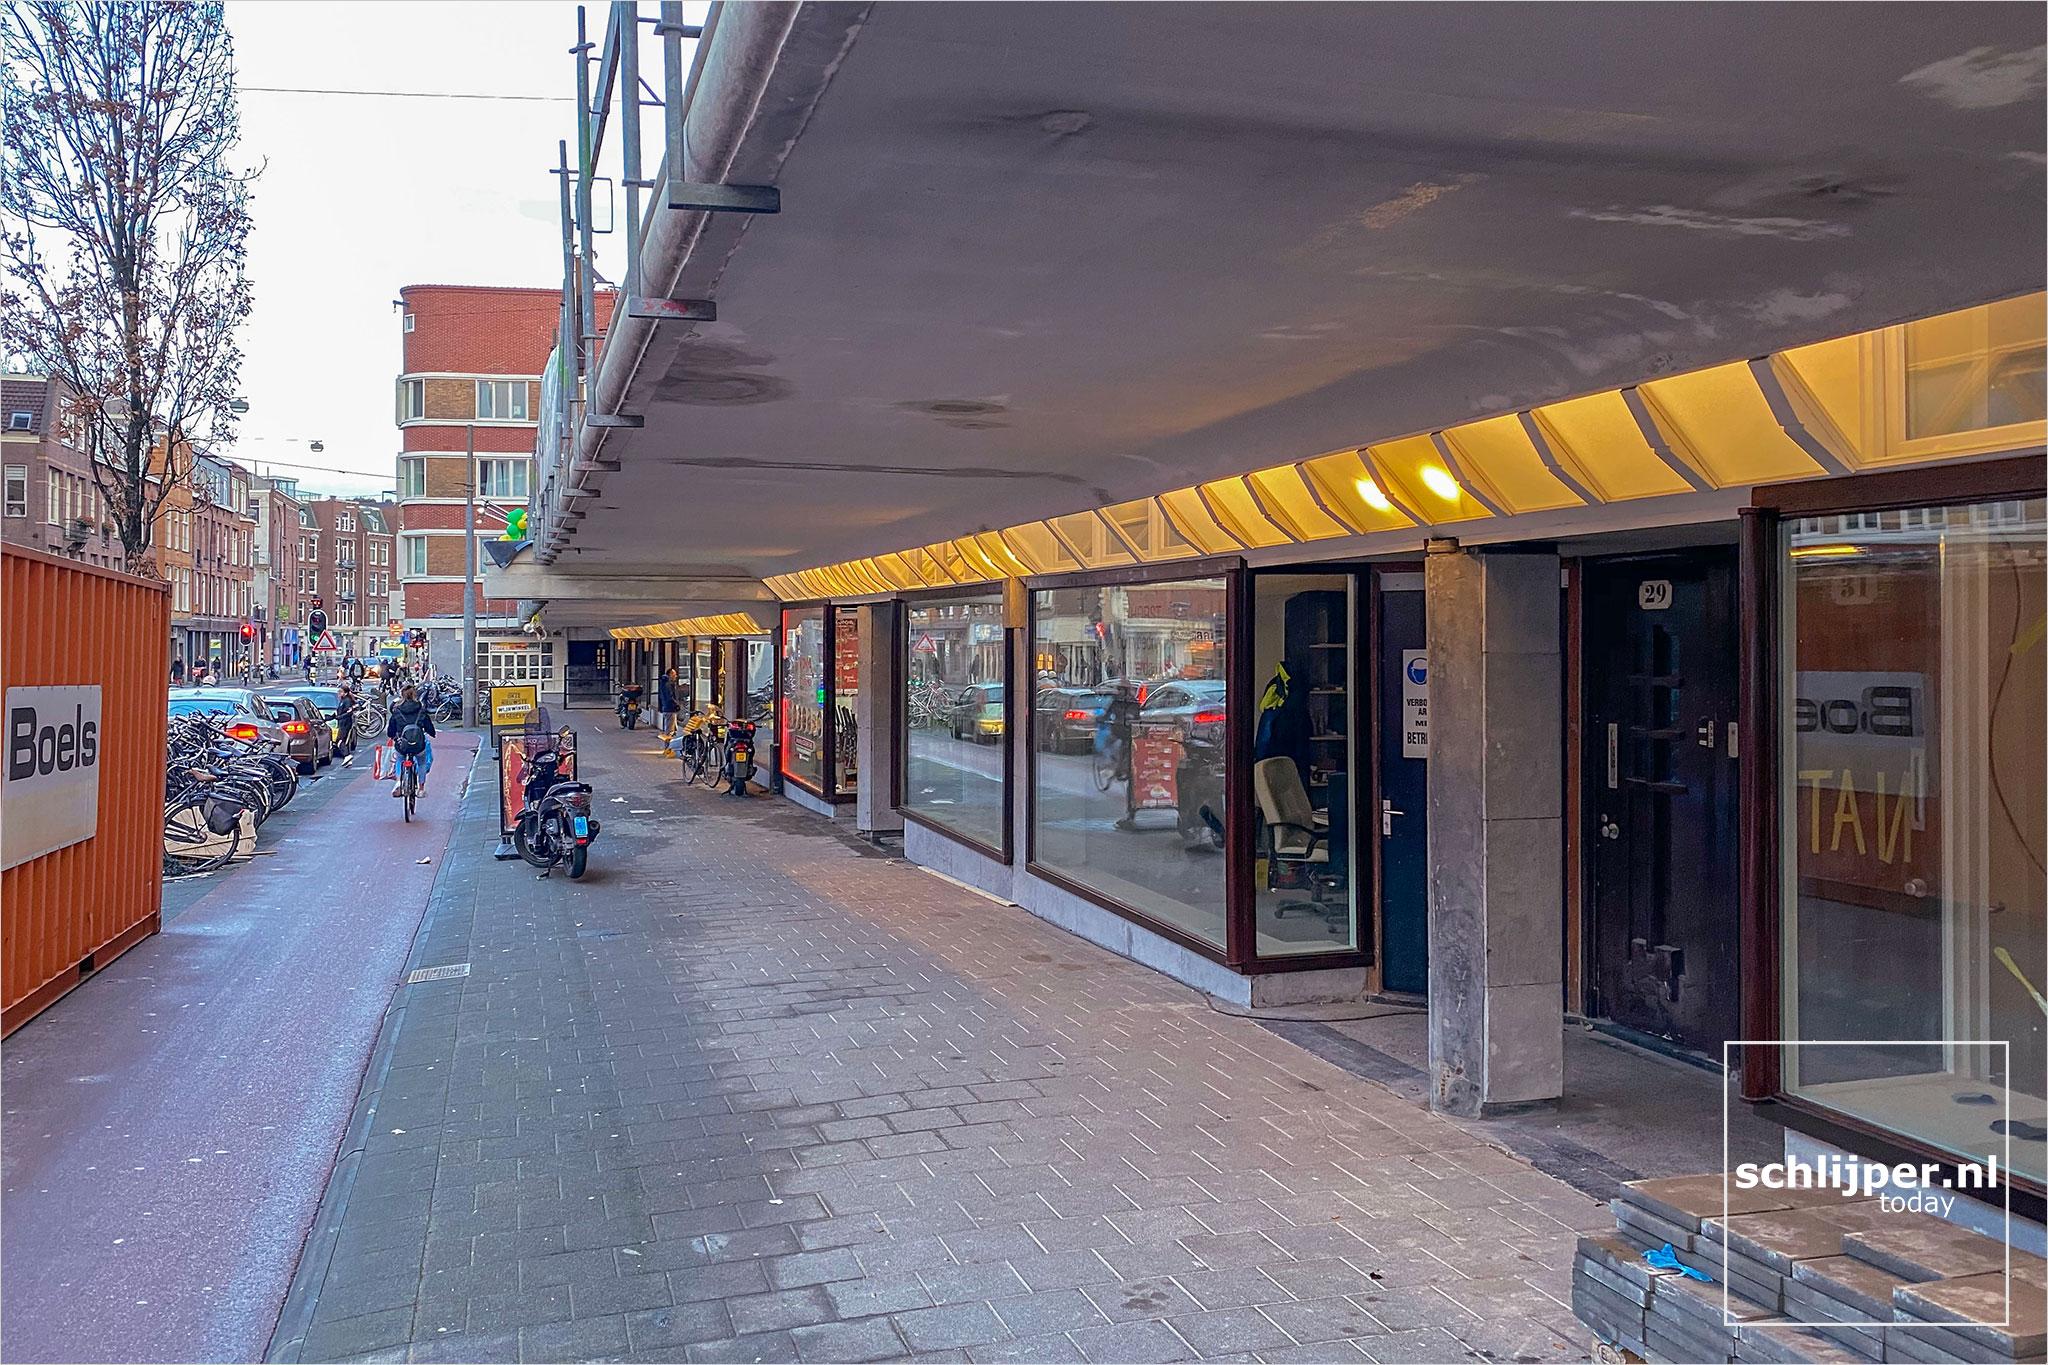 The Netherlands, Amsterdam, 13 december 2020